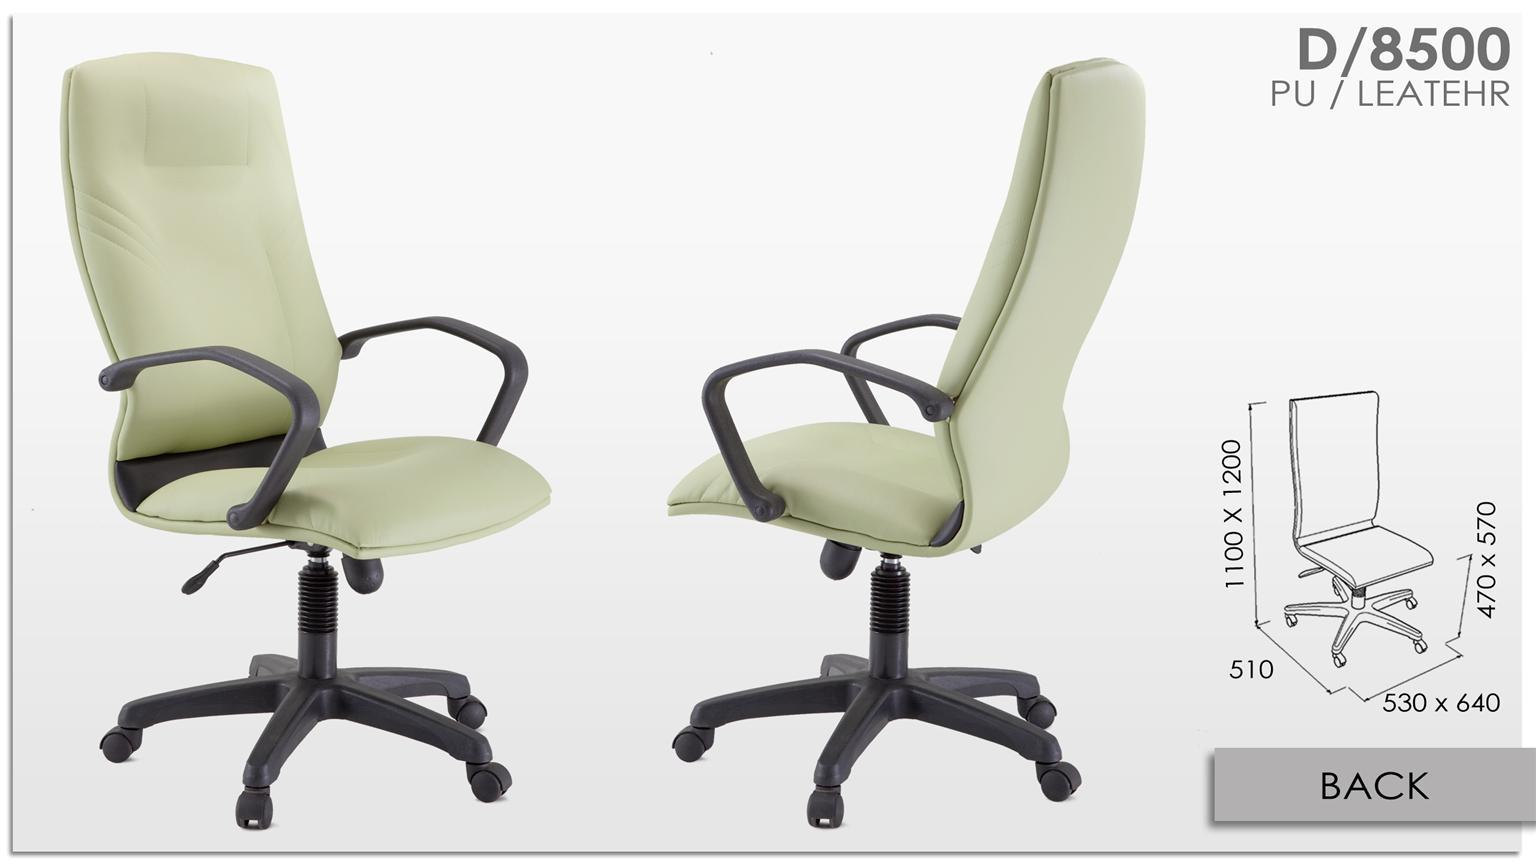 presidential office chair. Ergonomic Adjustable PU High Back Presidential Office Chair D/8500